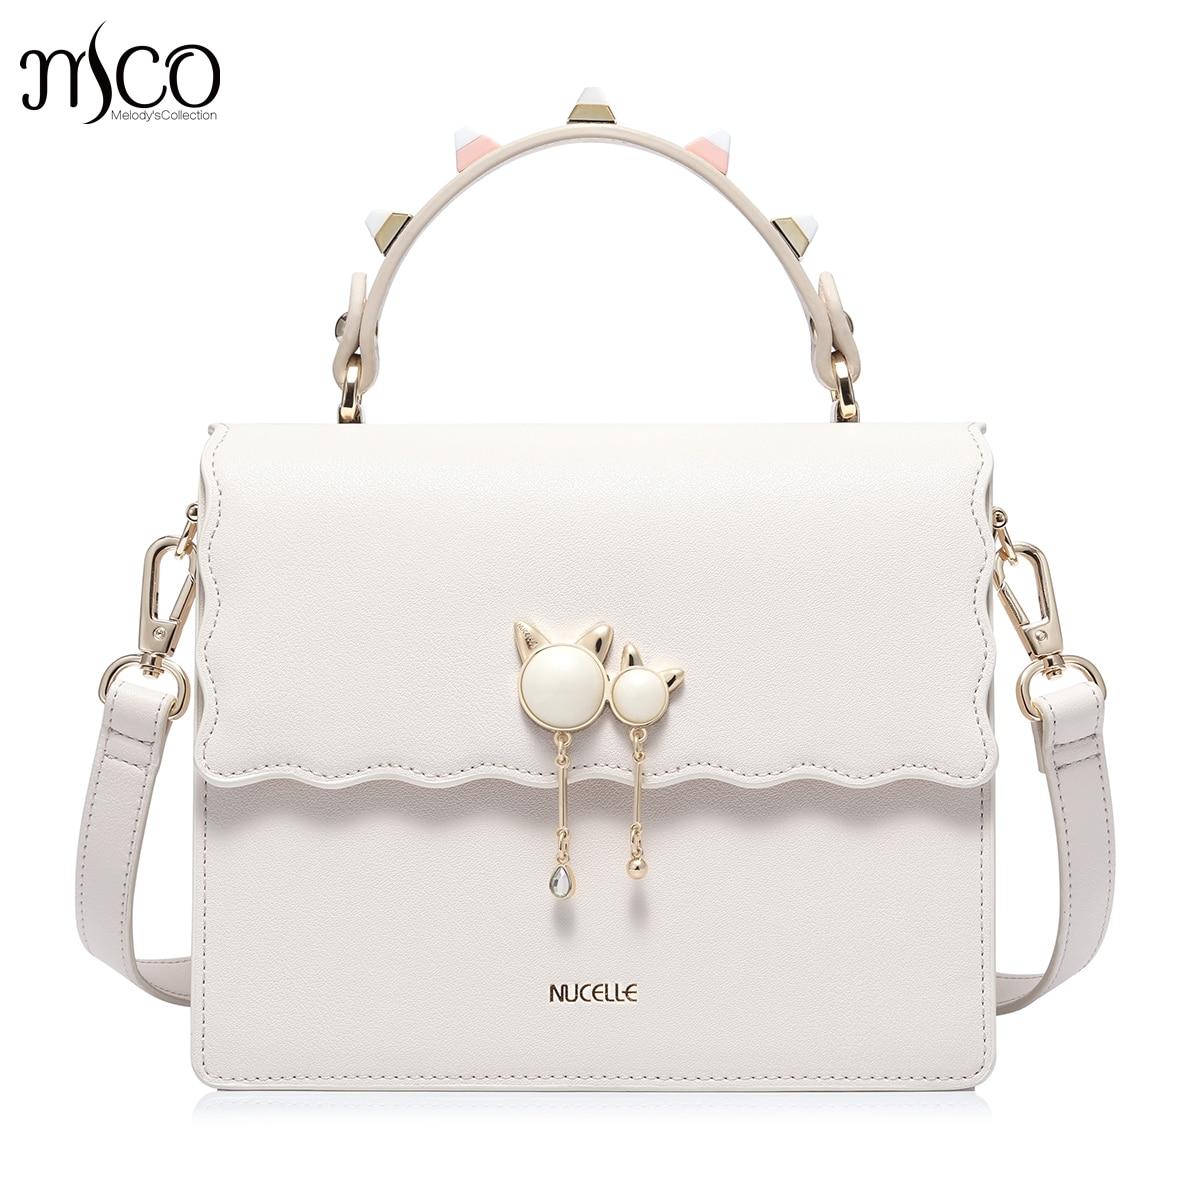 где купить Just Star 2018 Brand Design Fashion Classic PU Leather Women Girls Ladies Handbag Shoulder Bags High Quality Sac a Main дешево